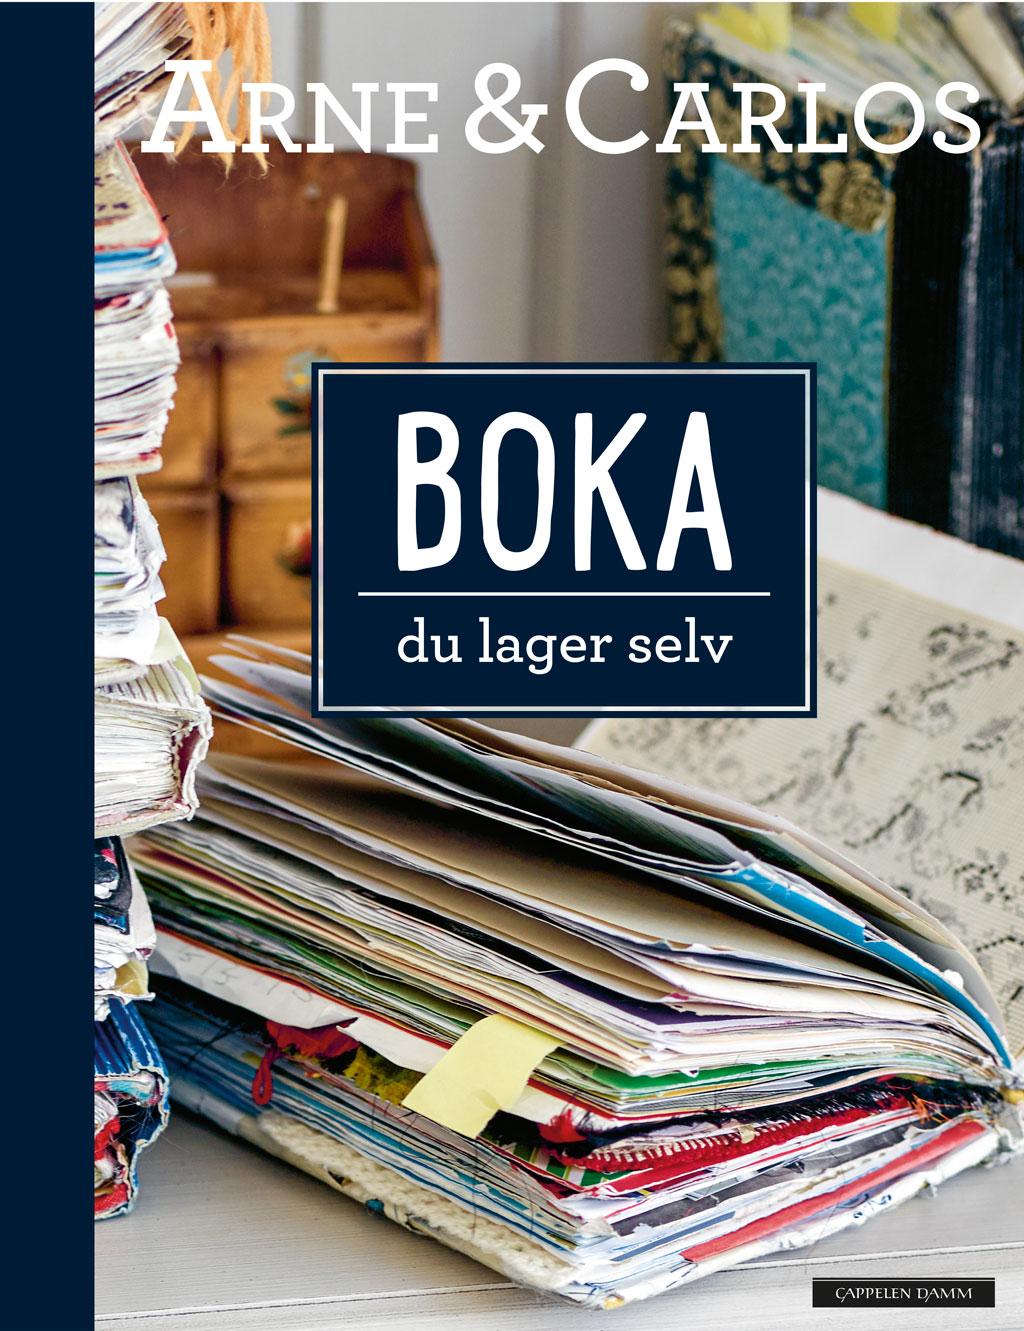 MAKE YOUR OWN IDEA BOOK